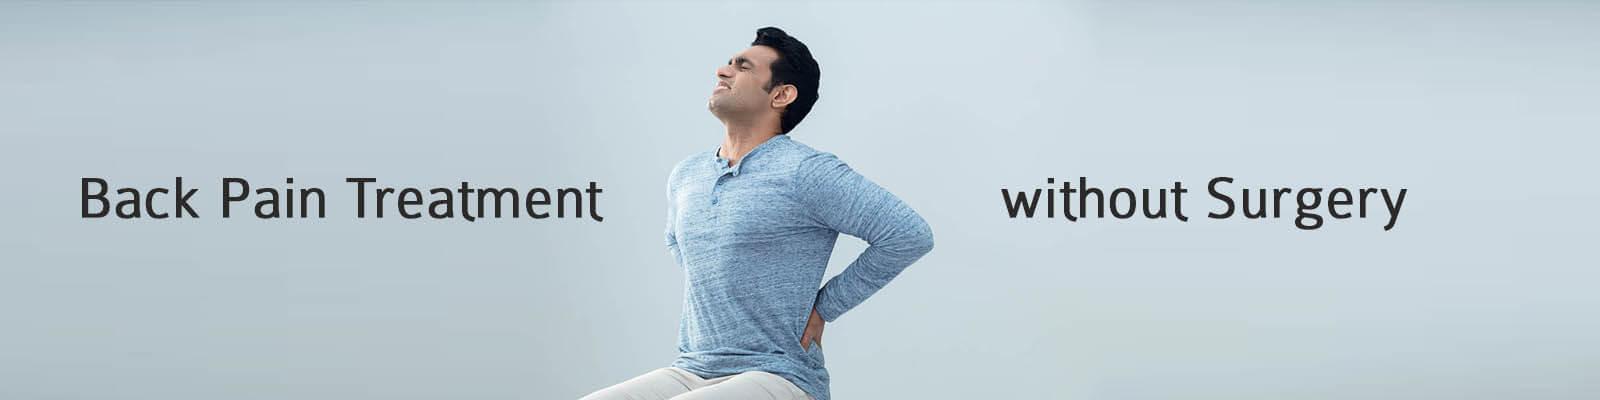 Top 10 Best Spine Surgeon Ahmedabad, Spine Doctor, Spine